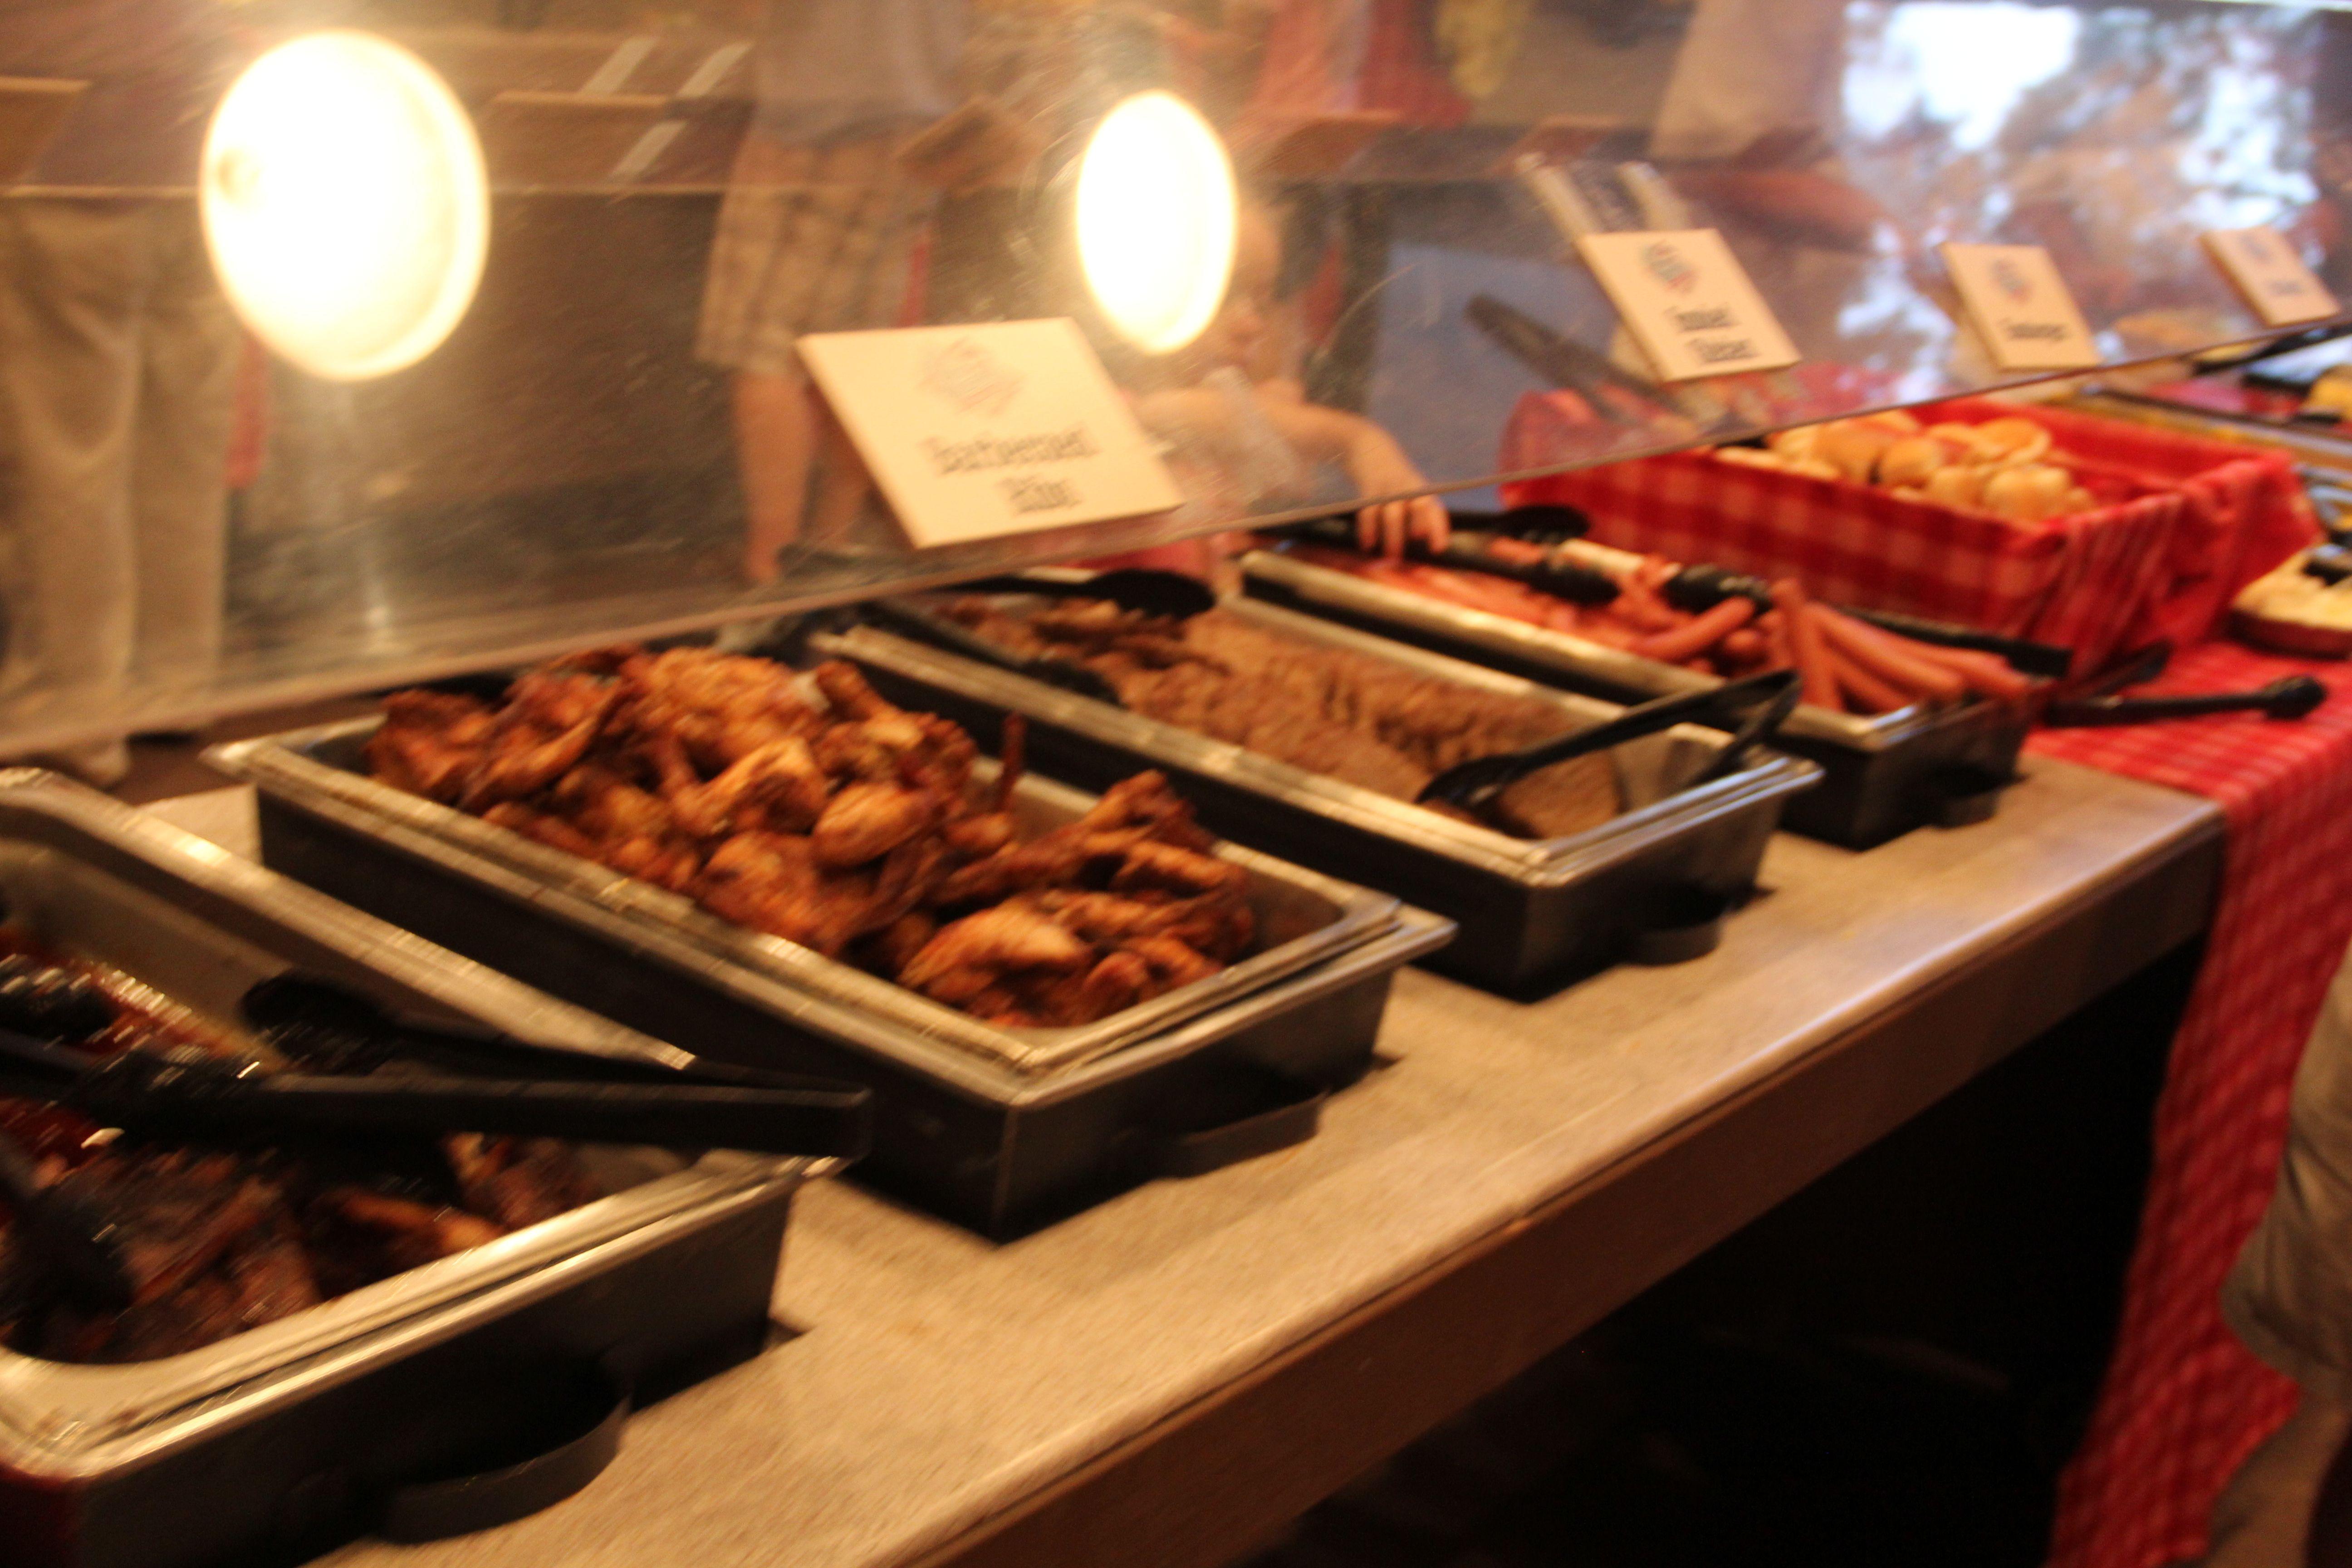 Mickey Backyard Bbq mickey's backyard bbq food | disney food in 2018 | pinterest